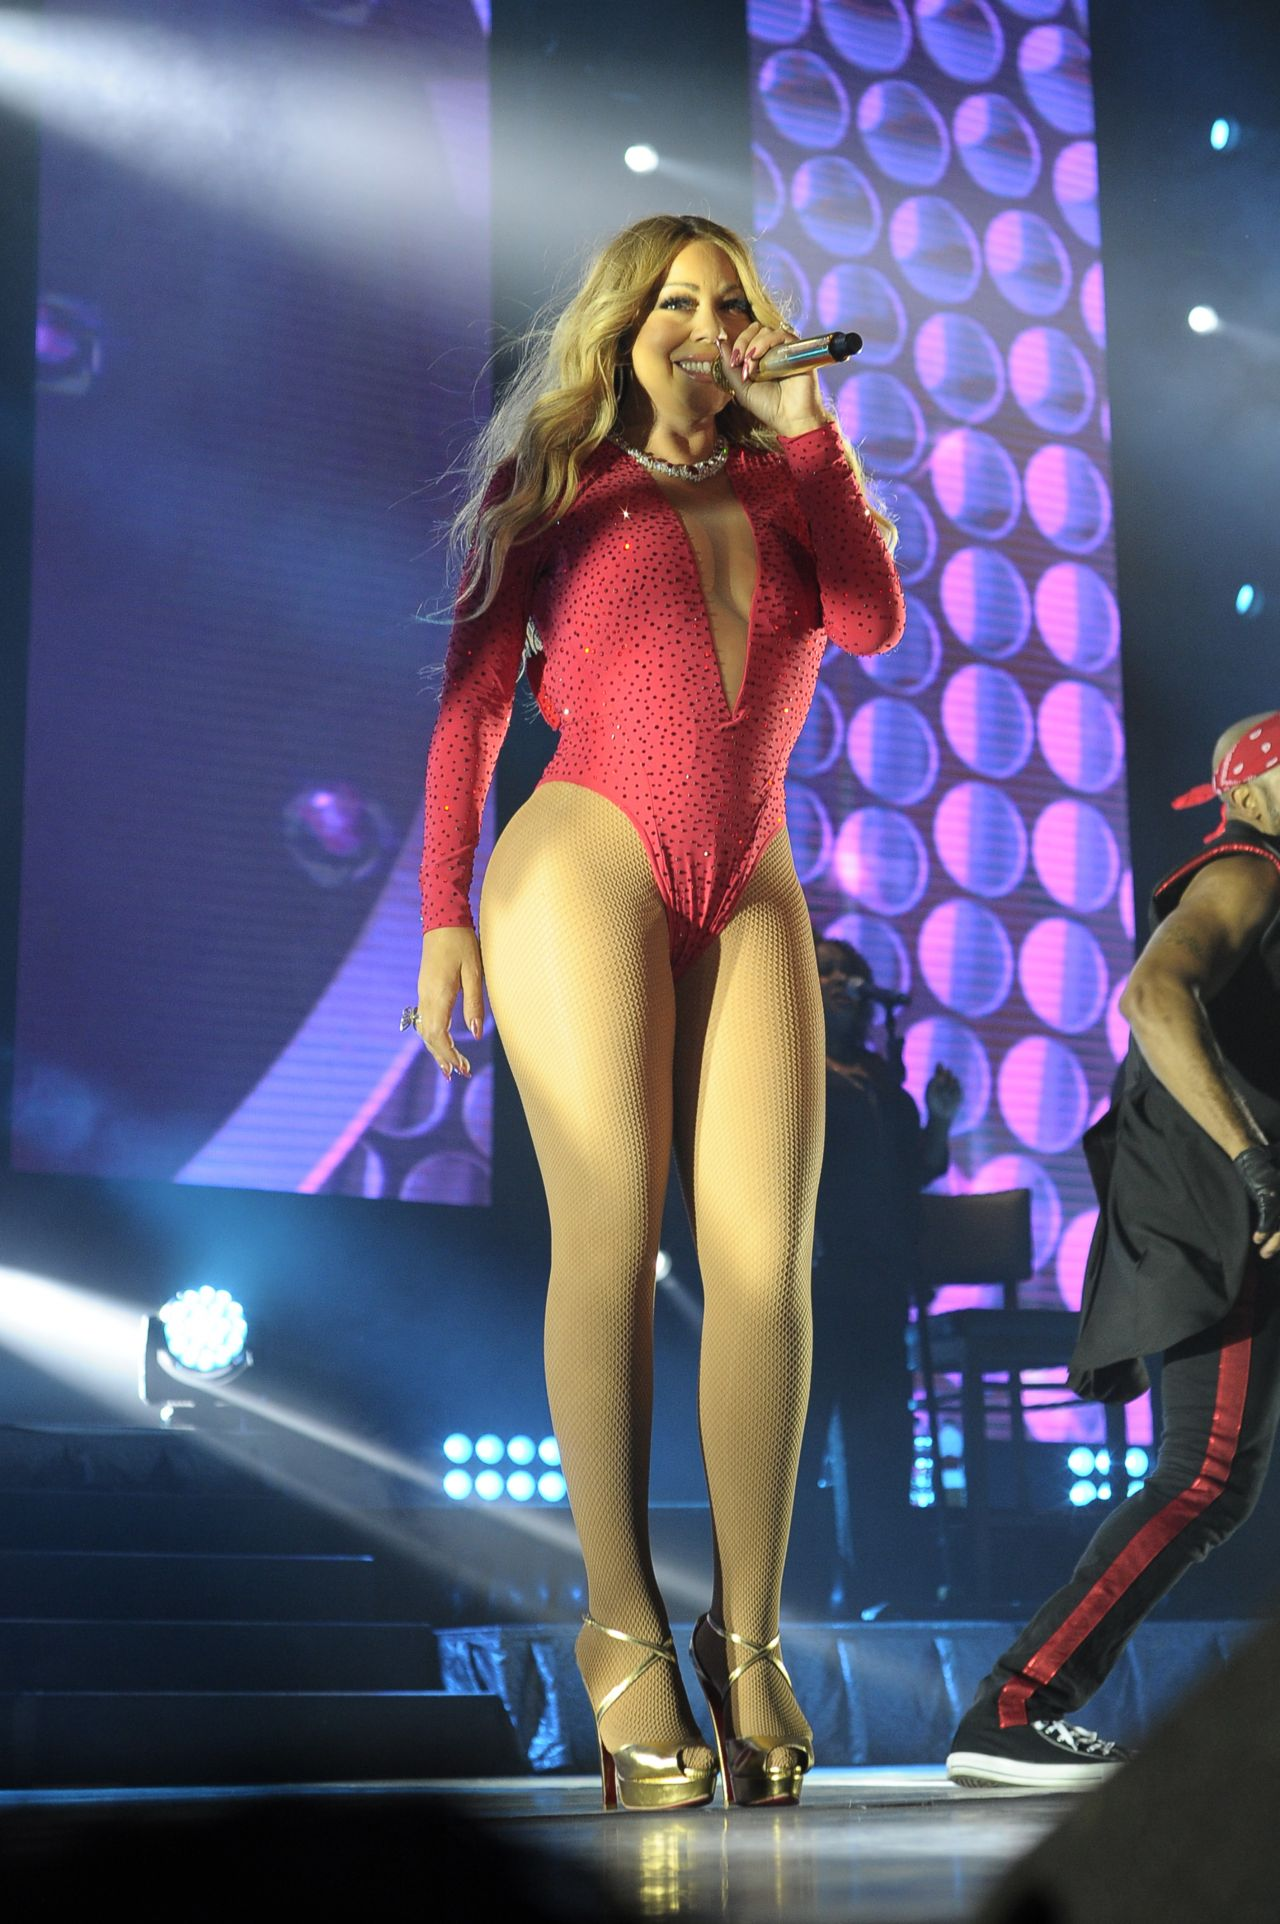 Mariah Carey - The Sweet Sweet Fantasy Tour in Mexico City ... мэрайя кэри